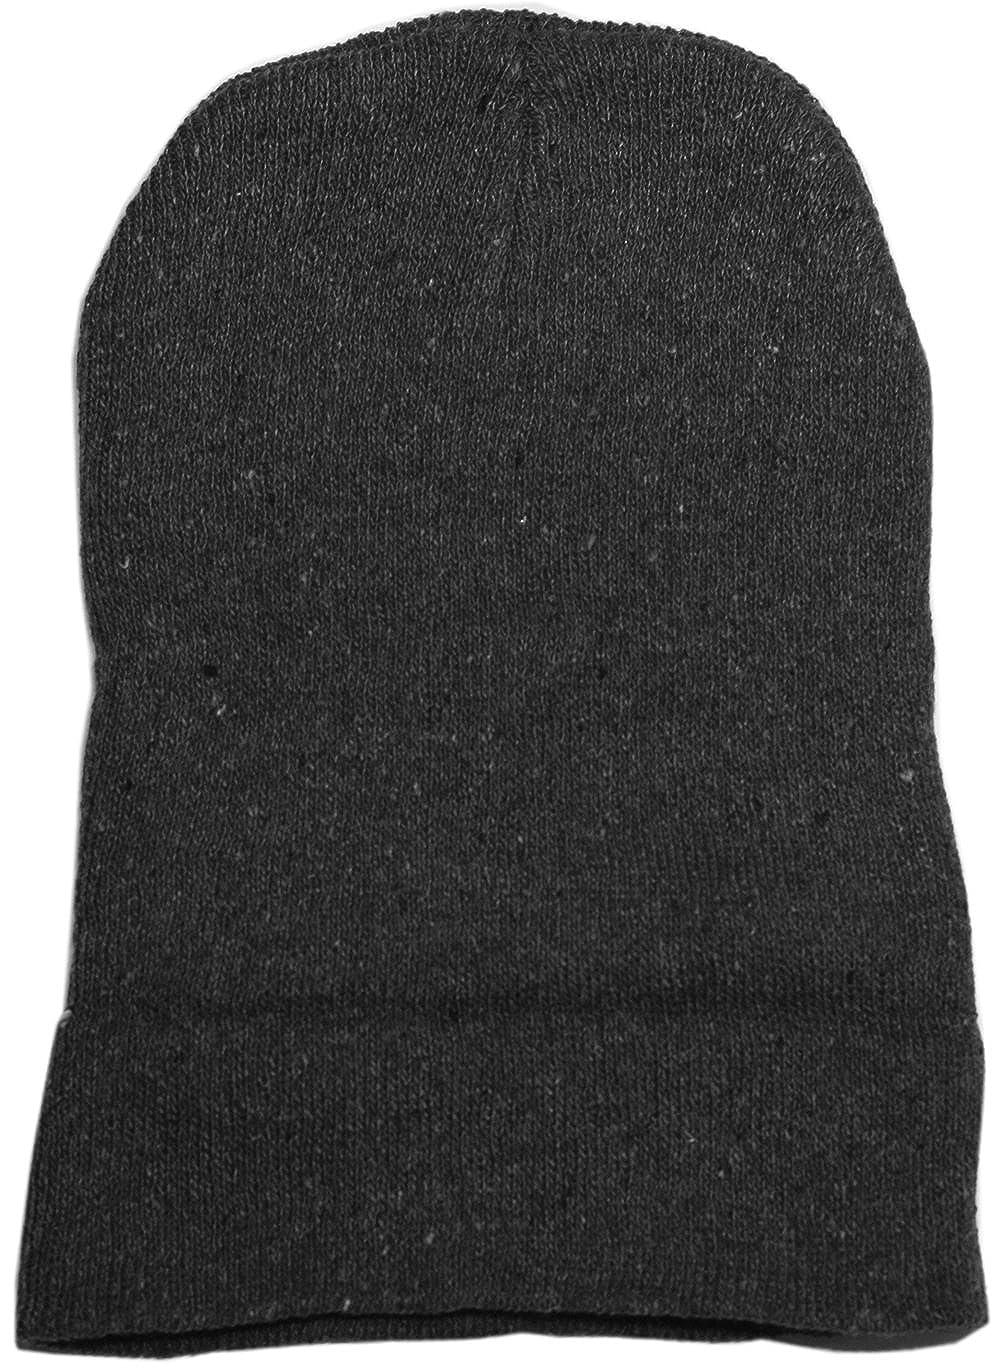 3199d8b2137 Beanie Ski Hat Snowboard Cap Ribbed Beanie Gray at Amazon Men s Clothing  store